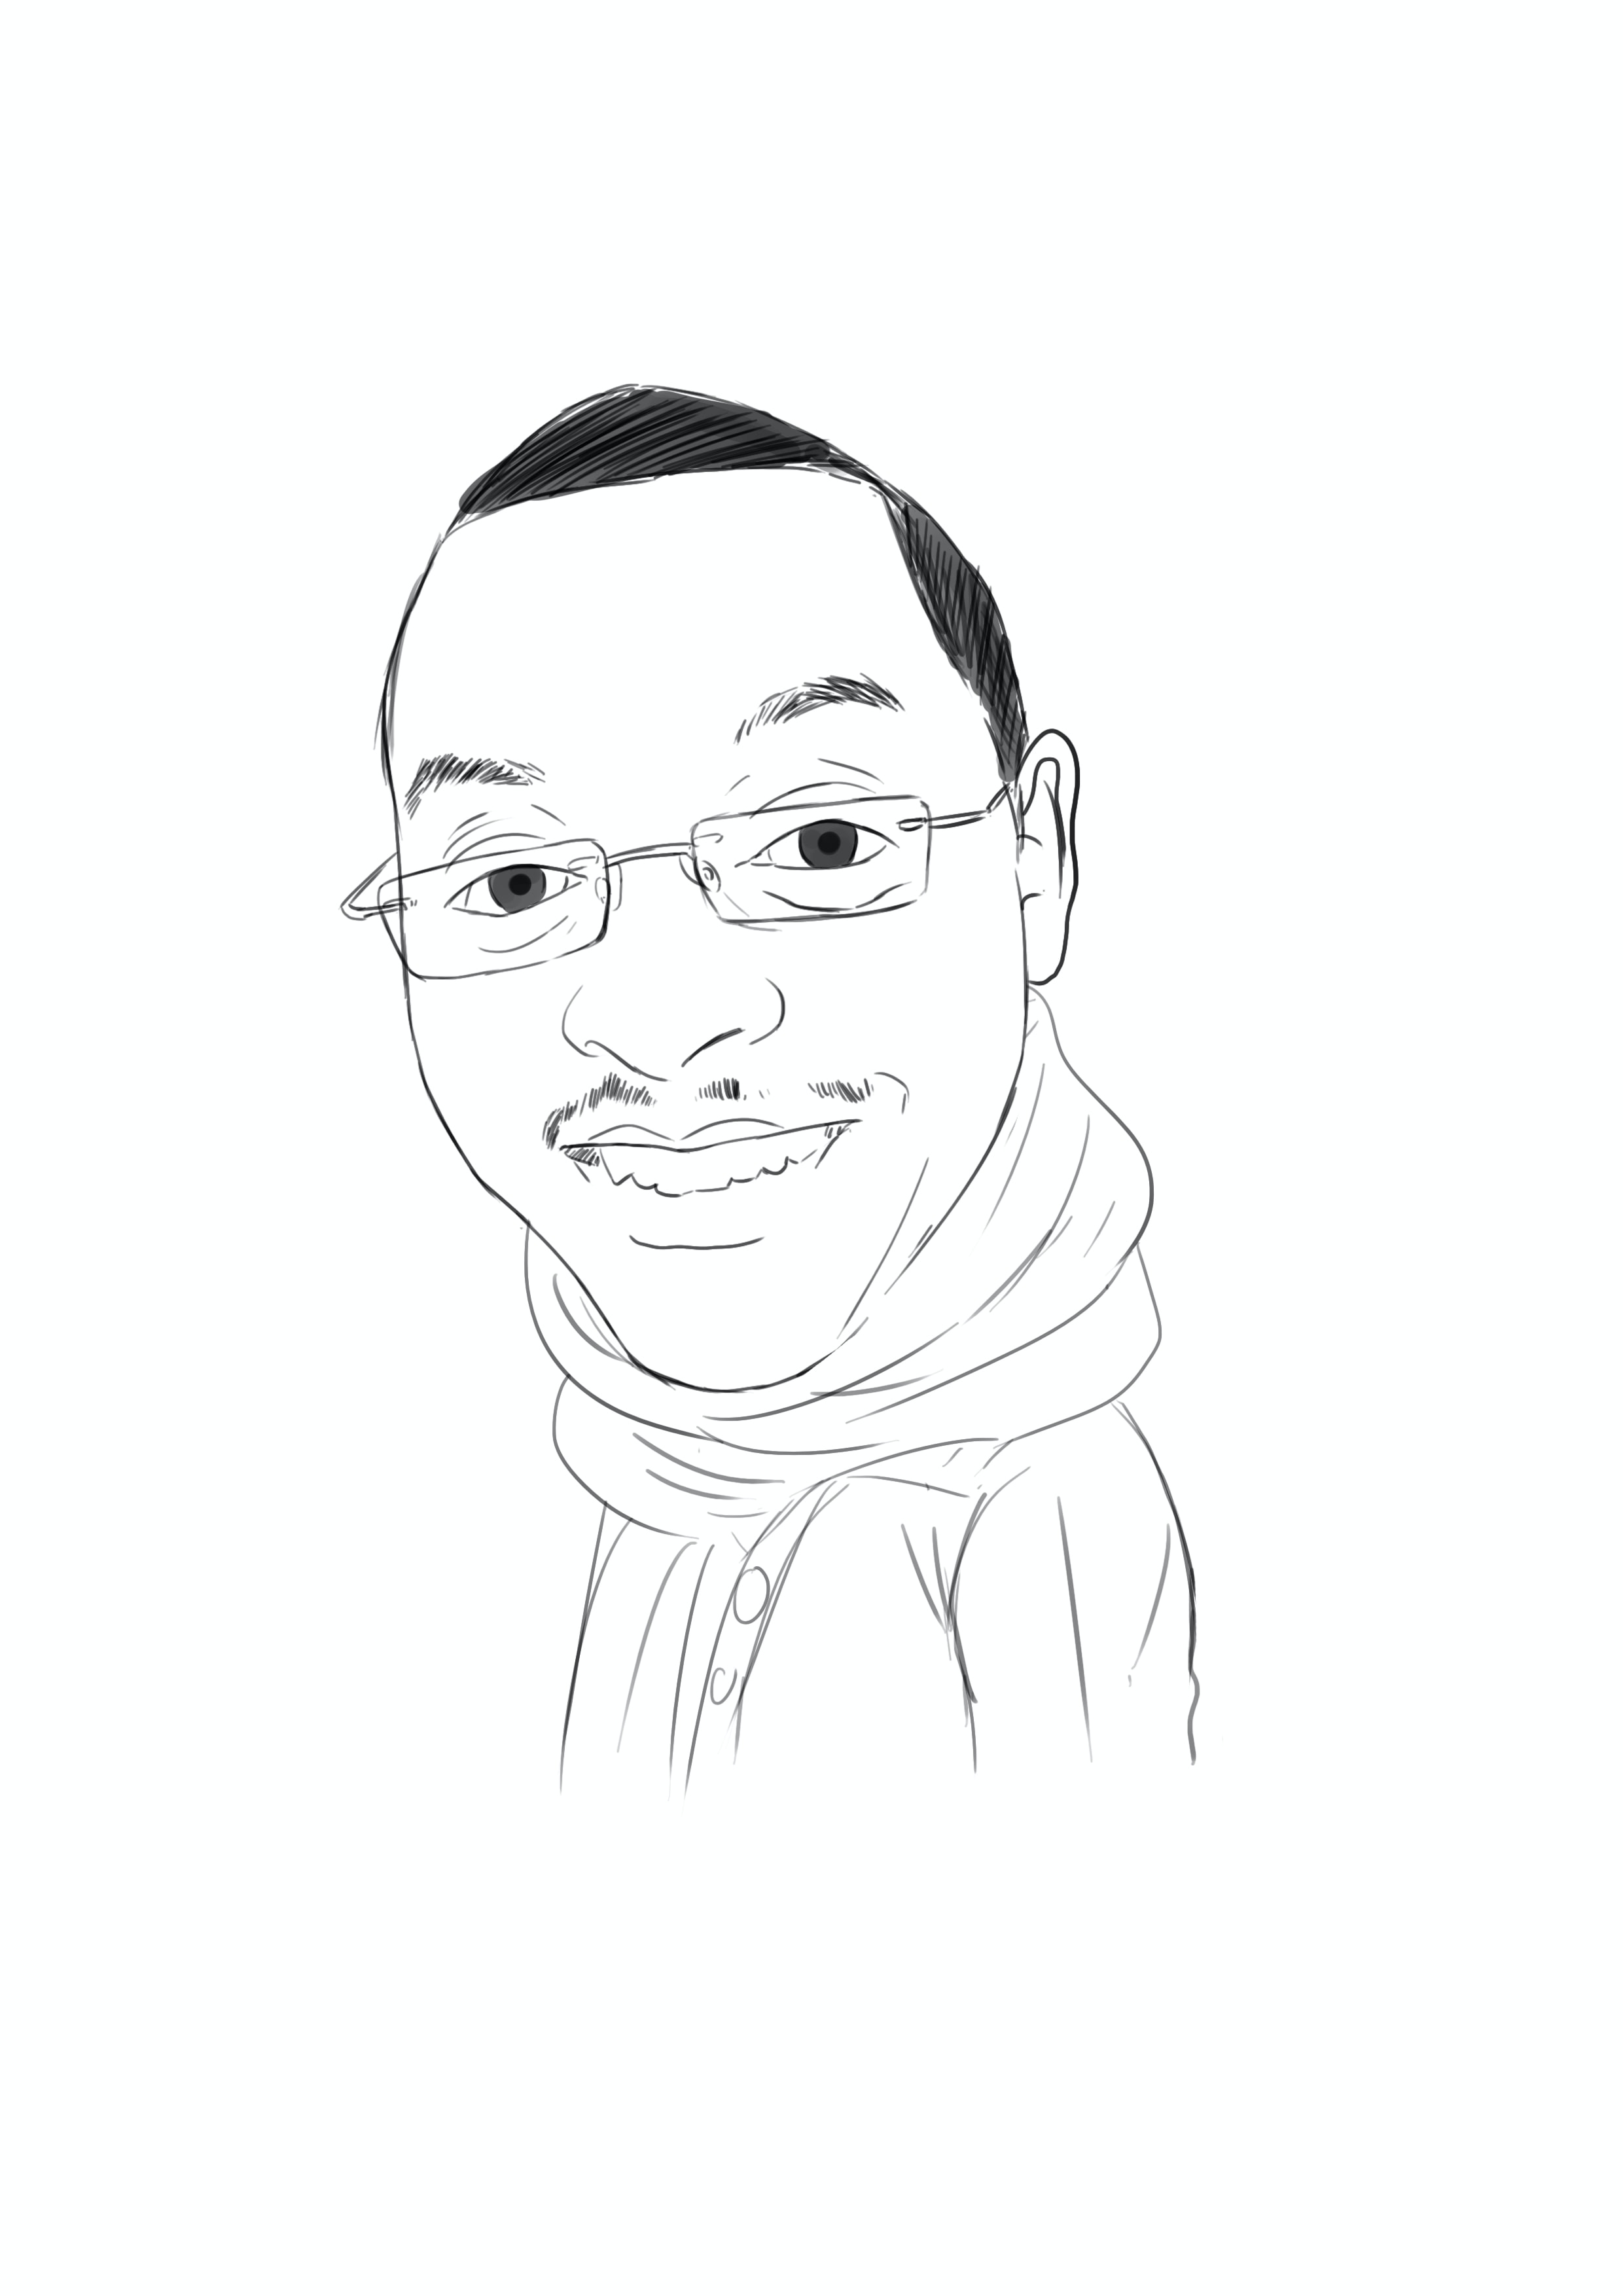 Go to Joel Mbugua's profile